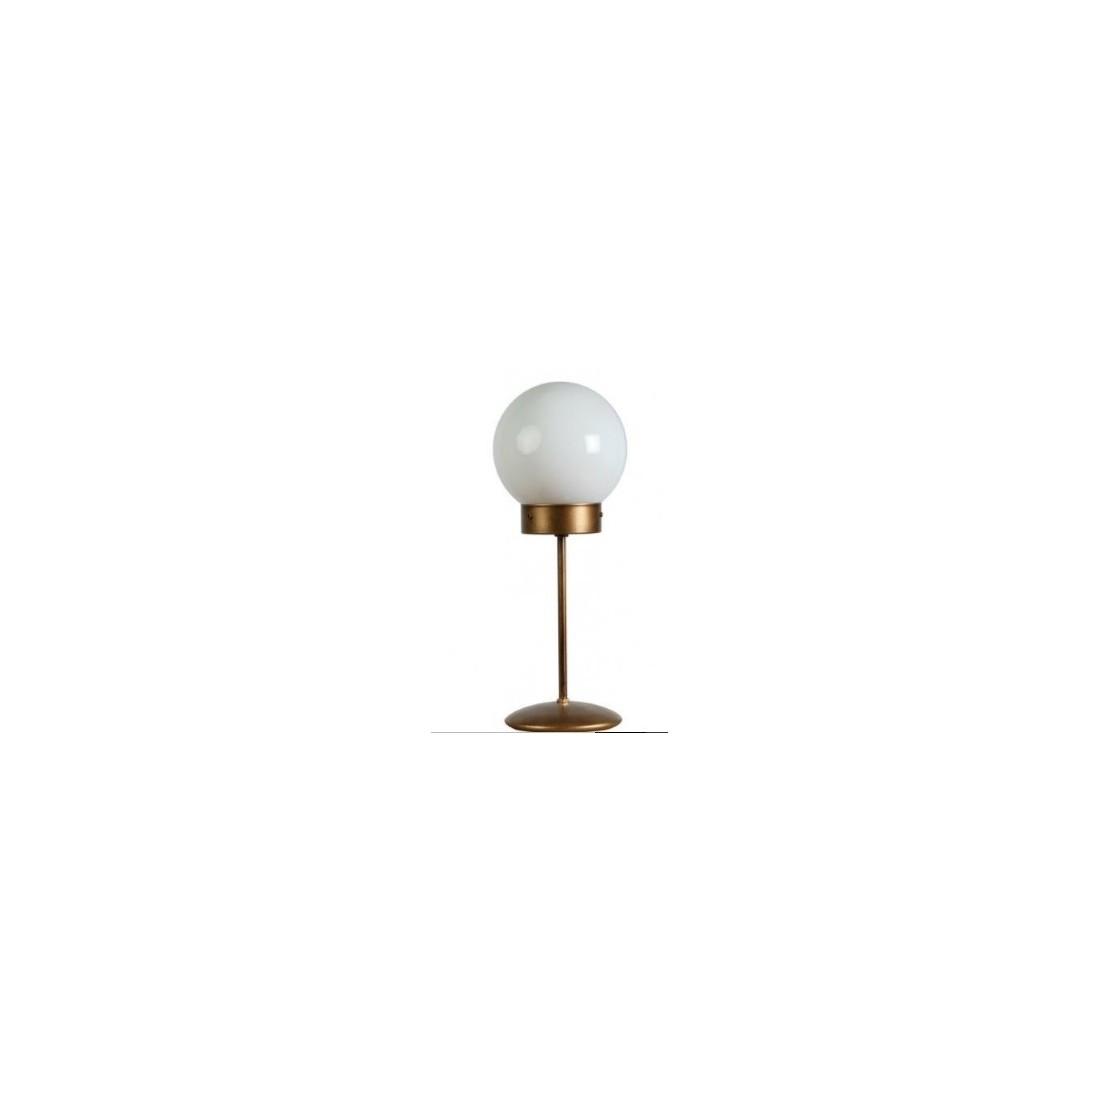 Lamparas baratas lamparas modernas baratas lamparas de - Lamparas salon baratas ...